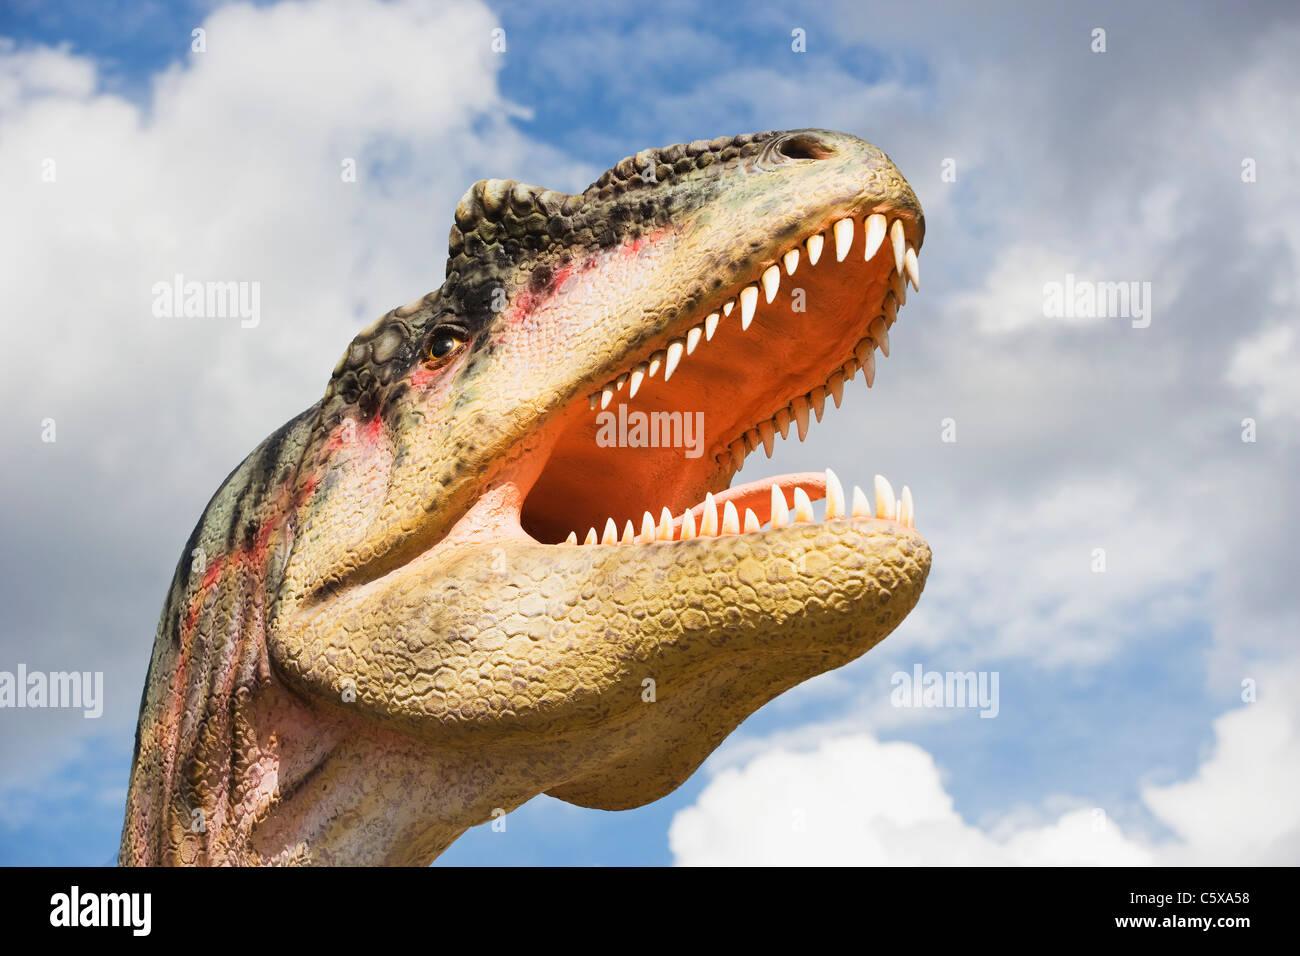 Tyrannosaurus Rex, Extinct species, Model, close up - Stock Image